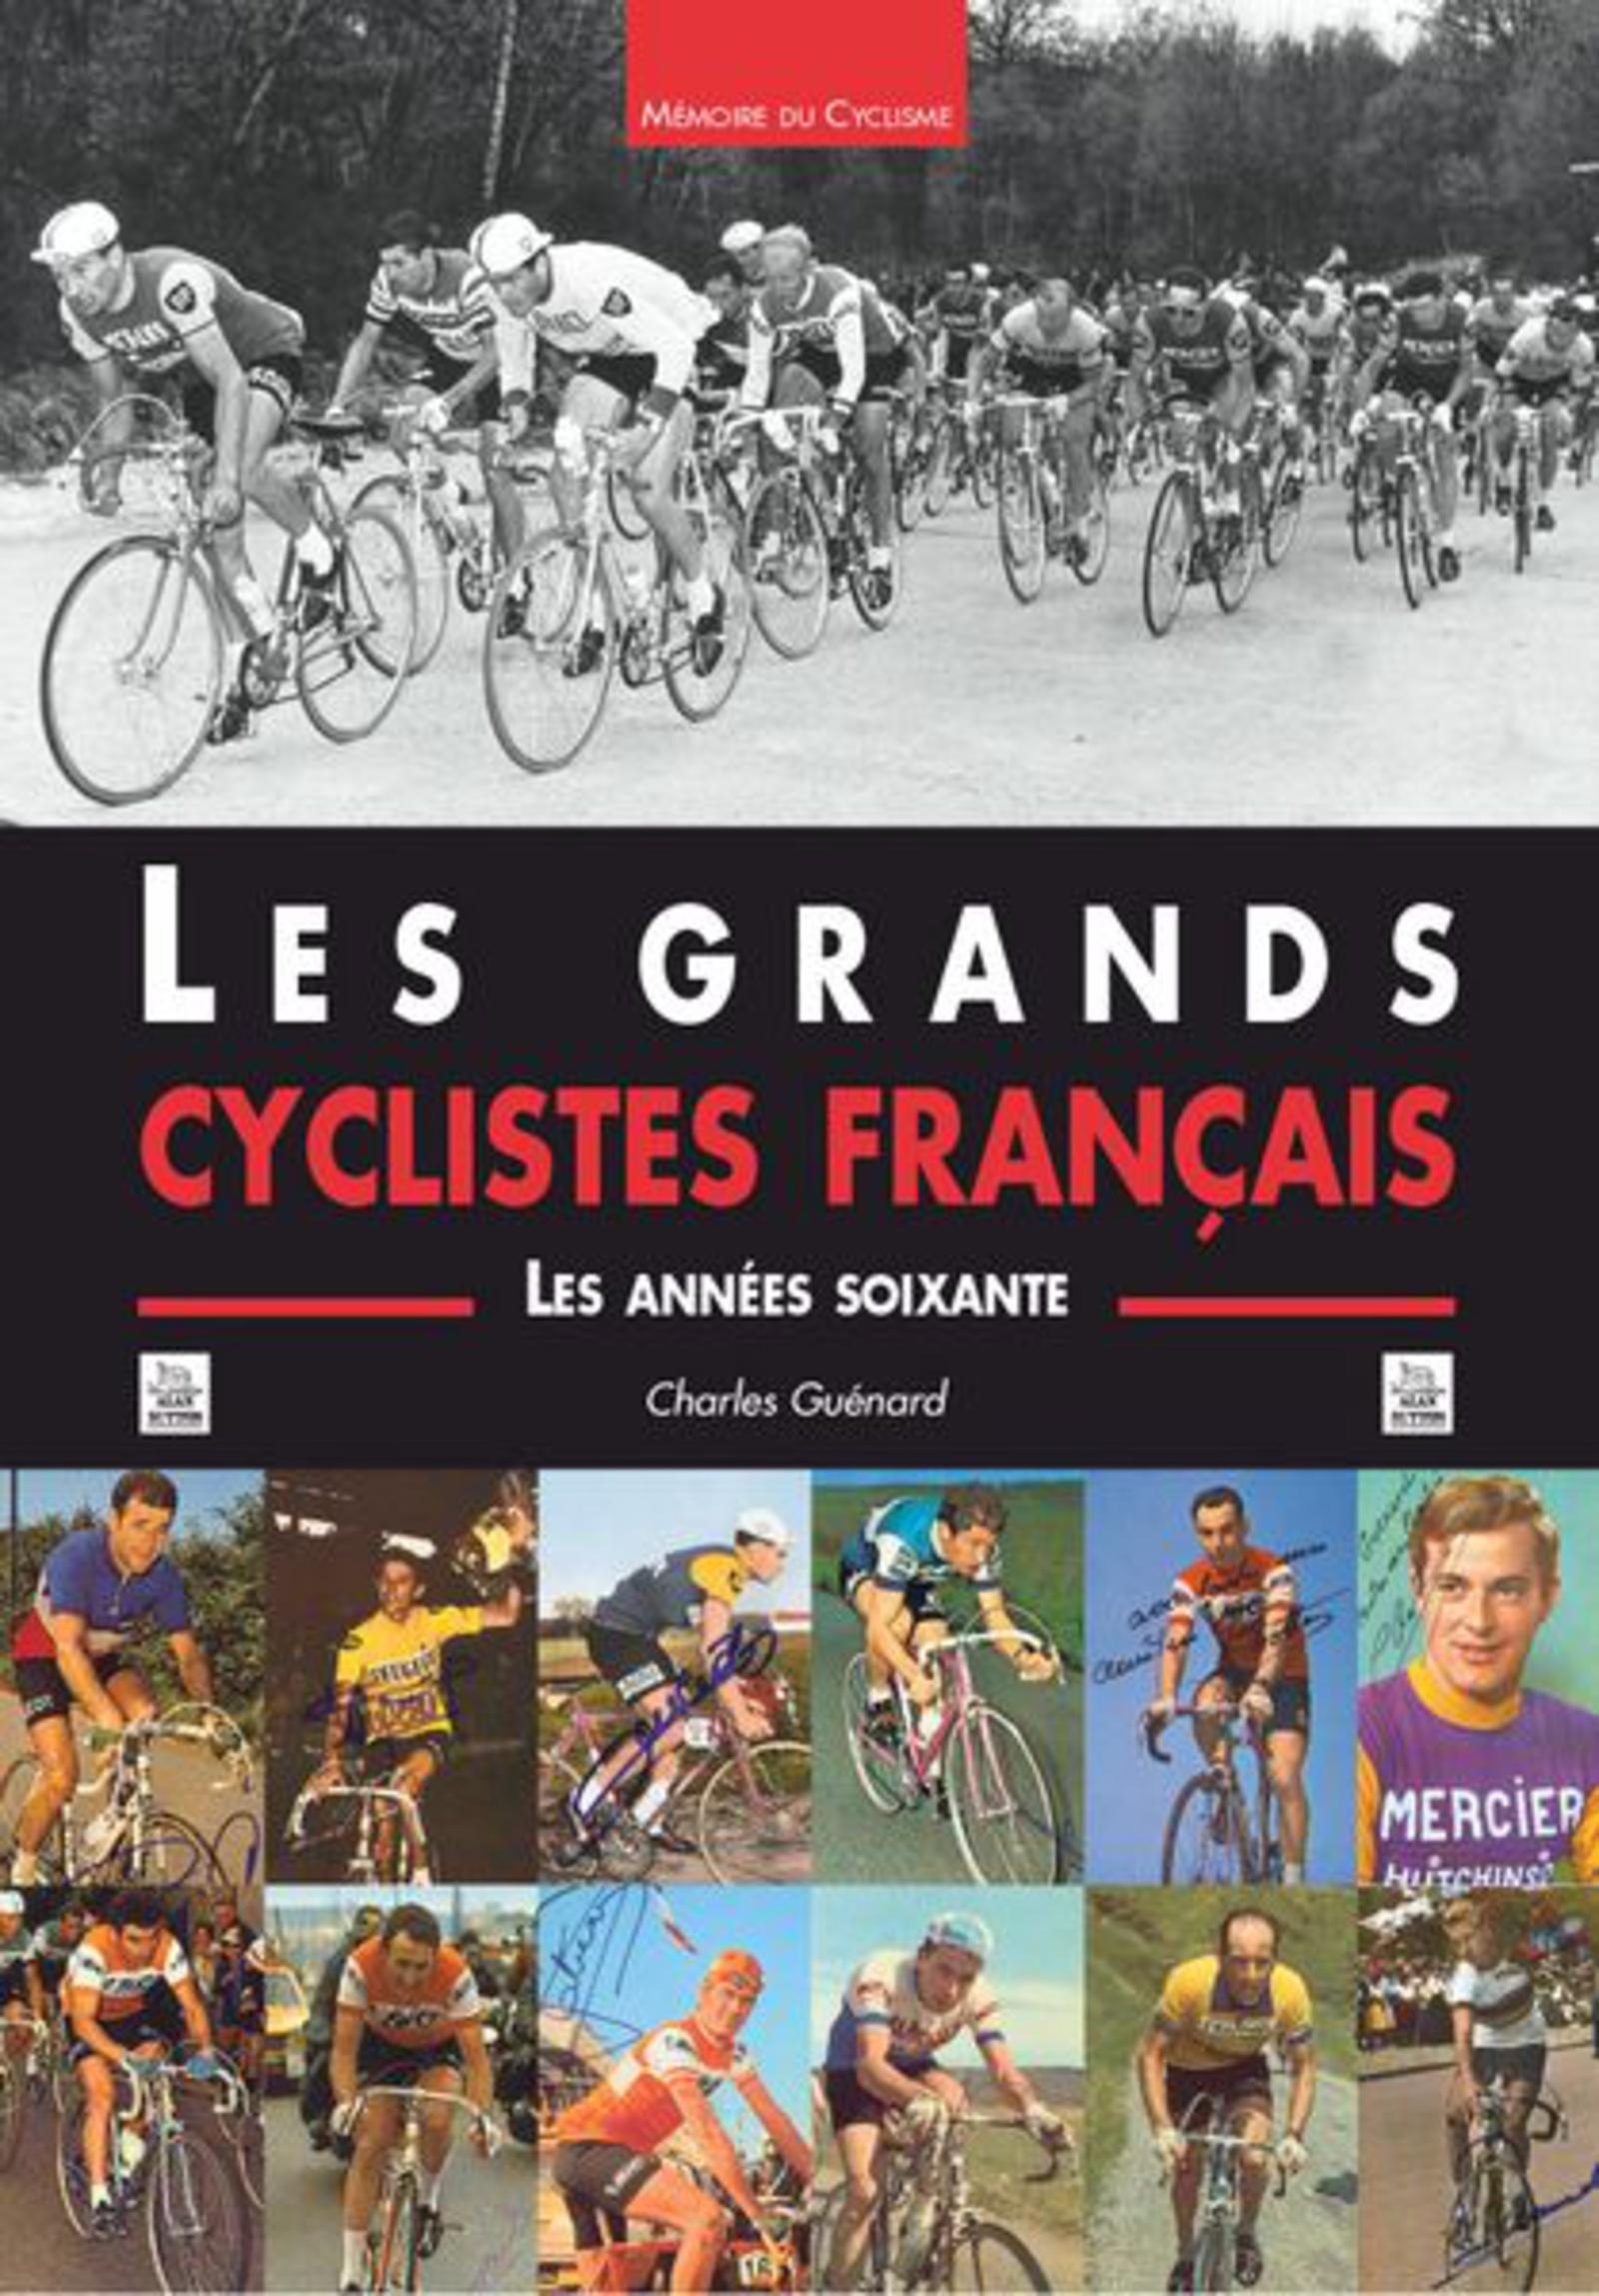 GRANDS CYCLISTES FRANCAIS (LES) - LES ANNEES SOIXANTE